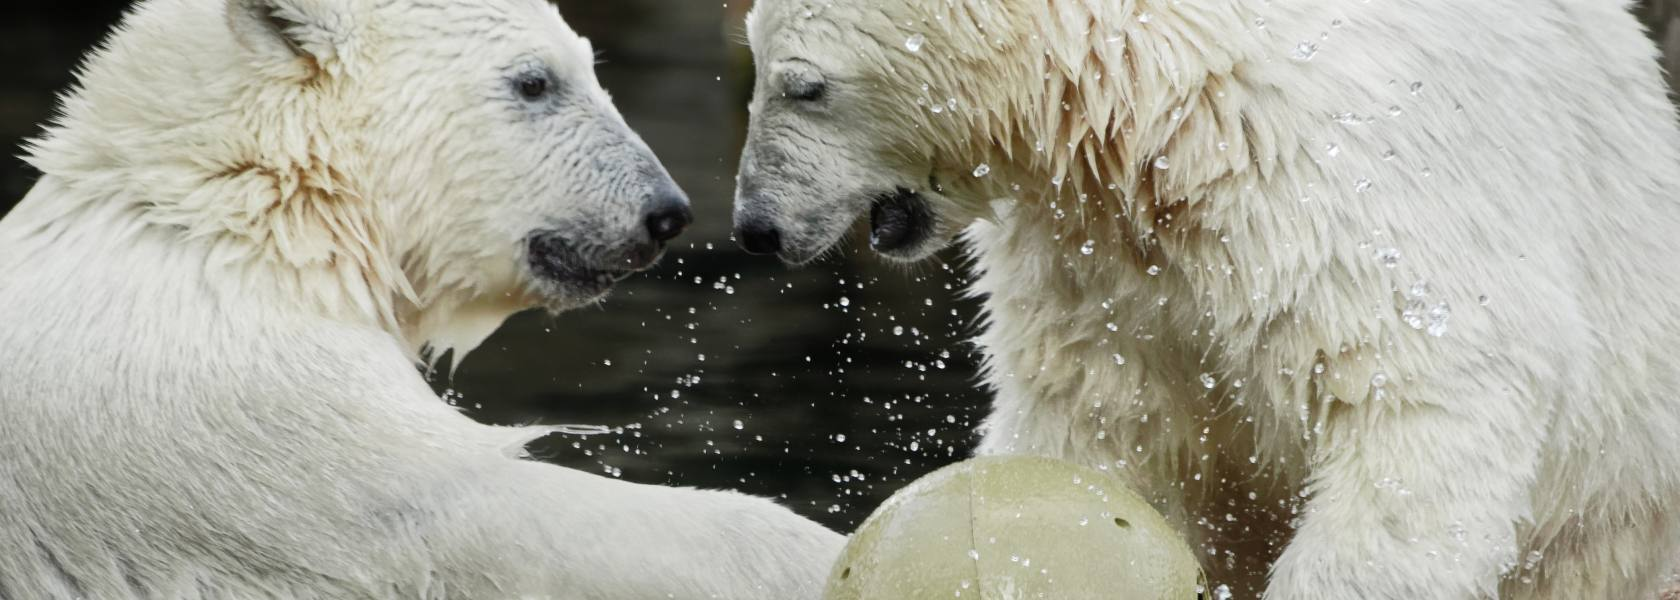 Eisbären Anna & Elsa, © Bernd Ohlthaver/Zoo am Meer Bremerhaven